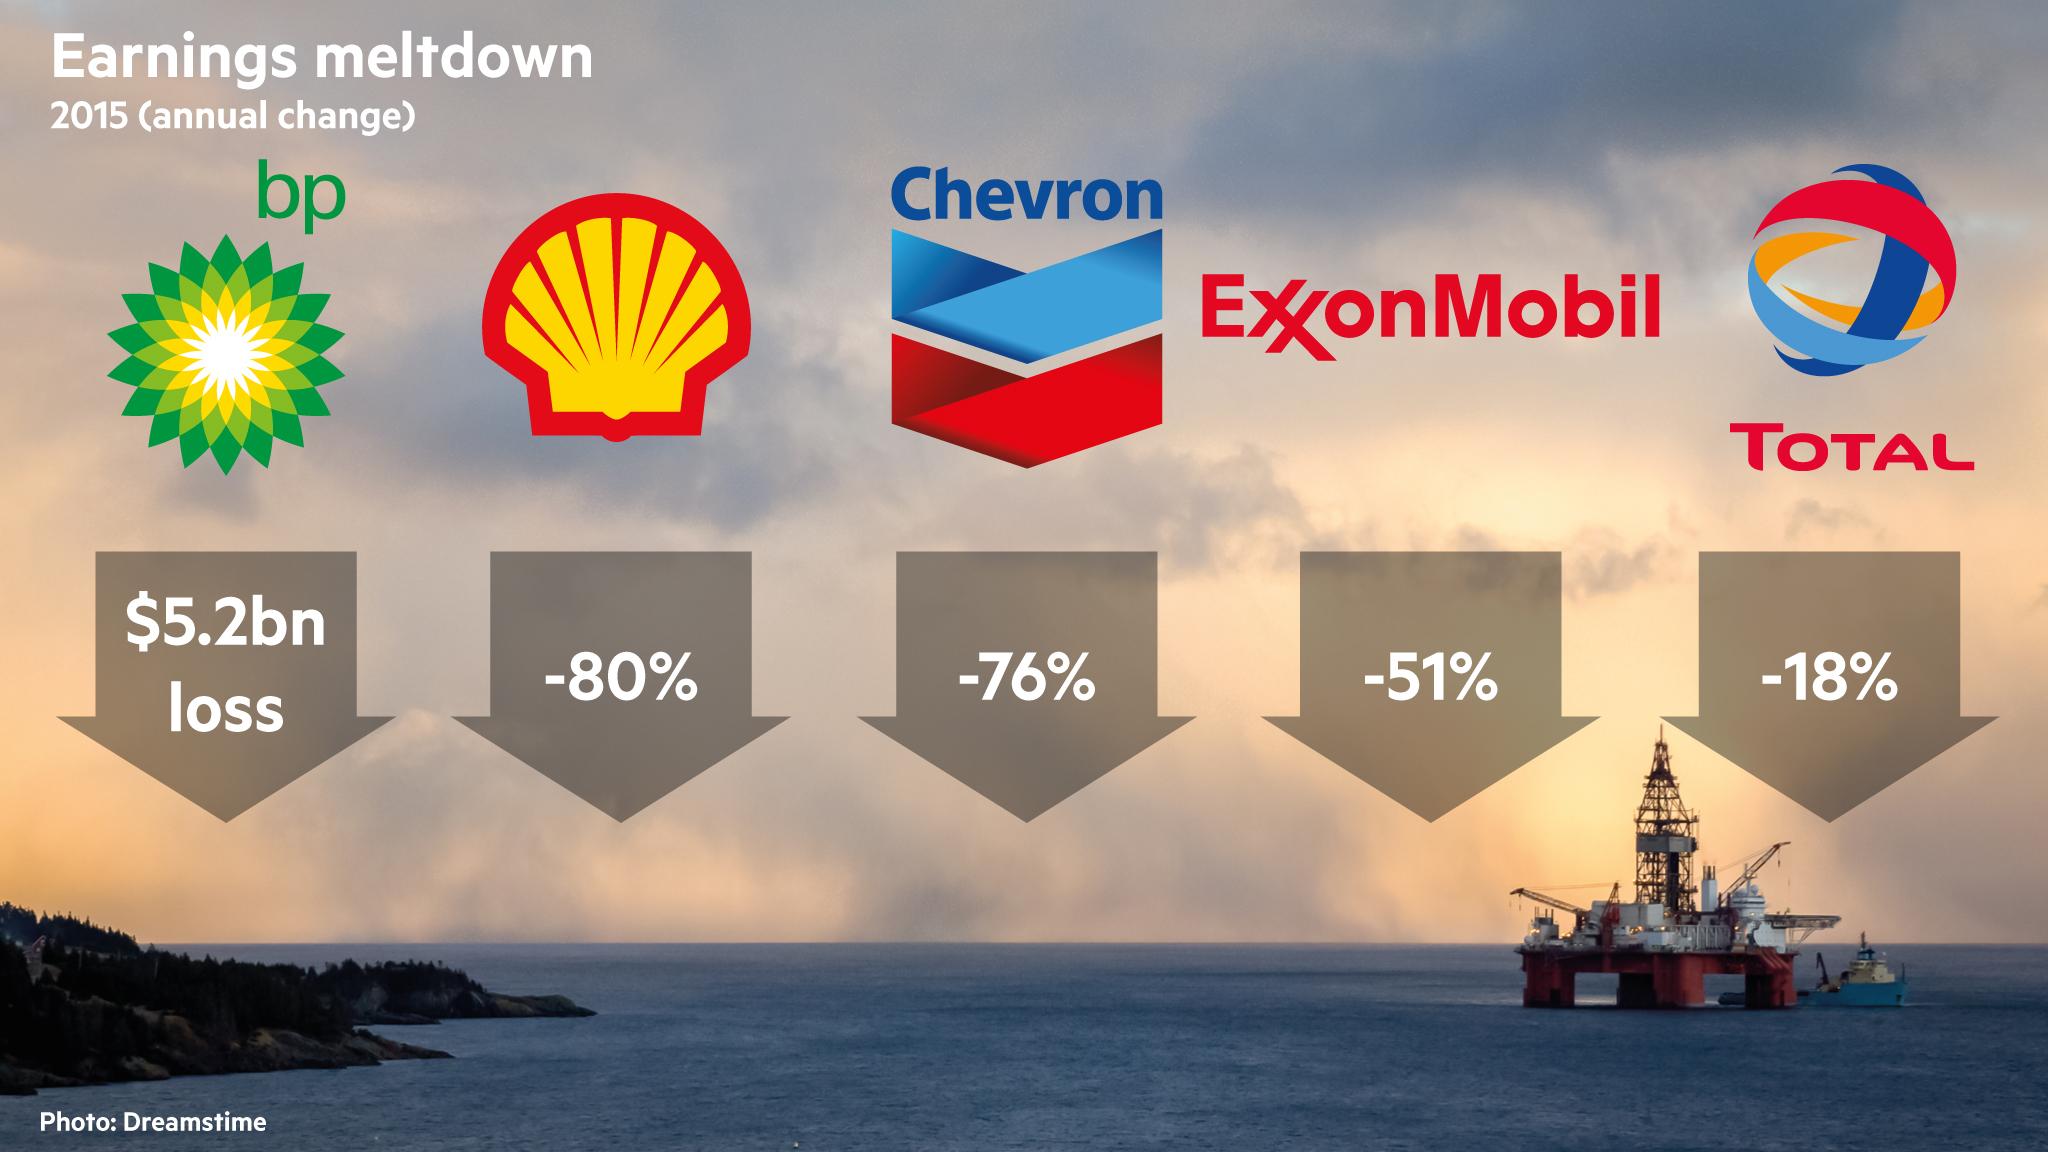 Fastest Car In The World Wallpaper Oil Majors Business Model Under Increasing Pressure